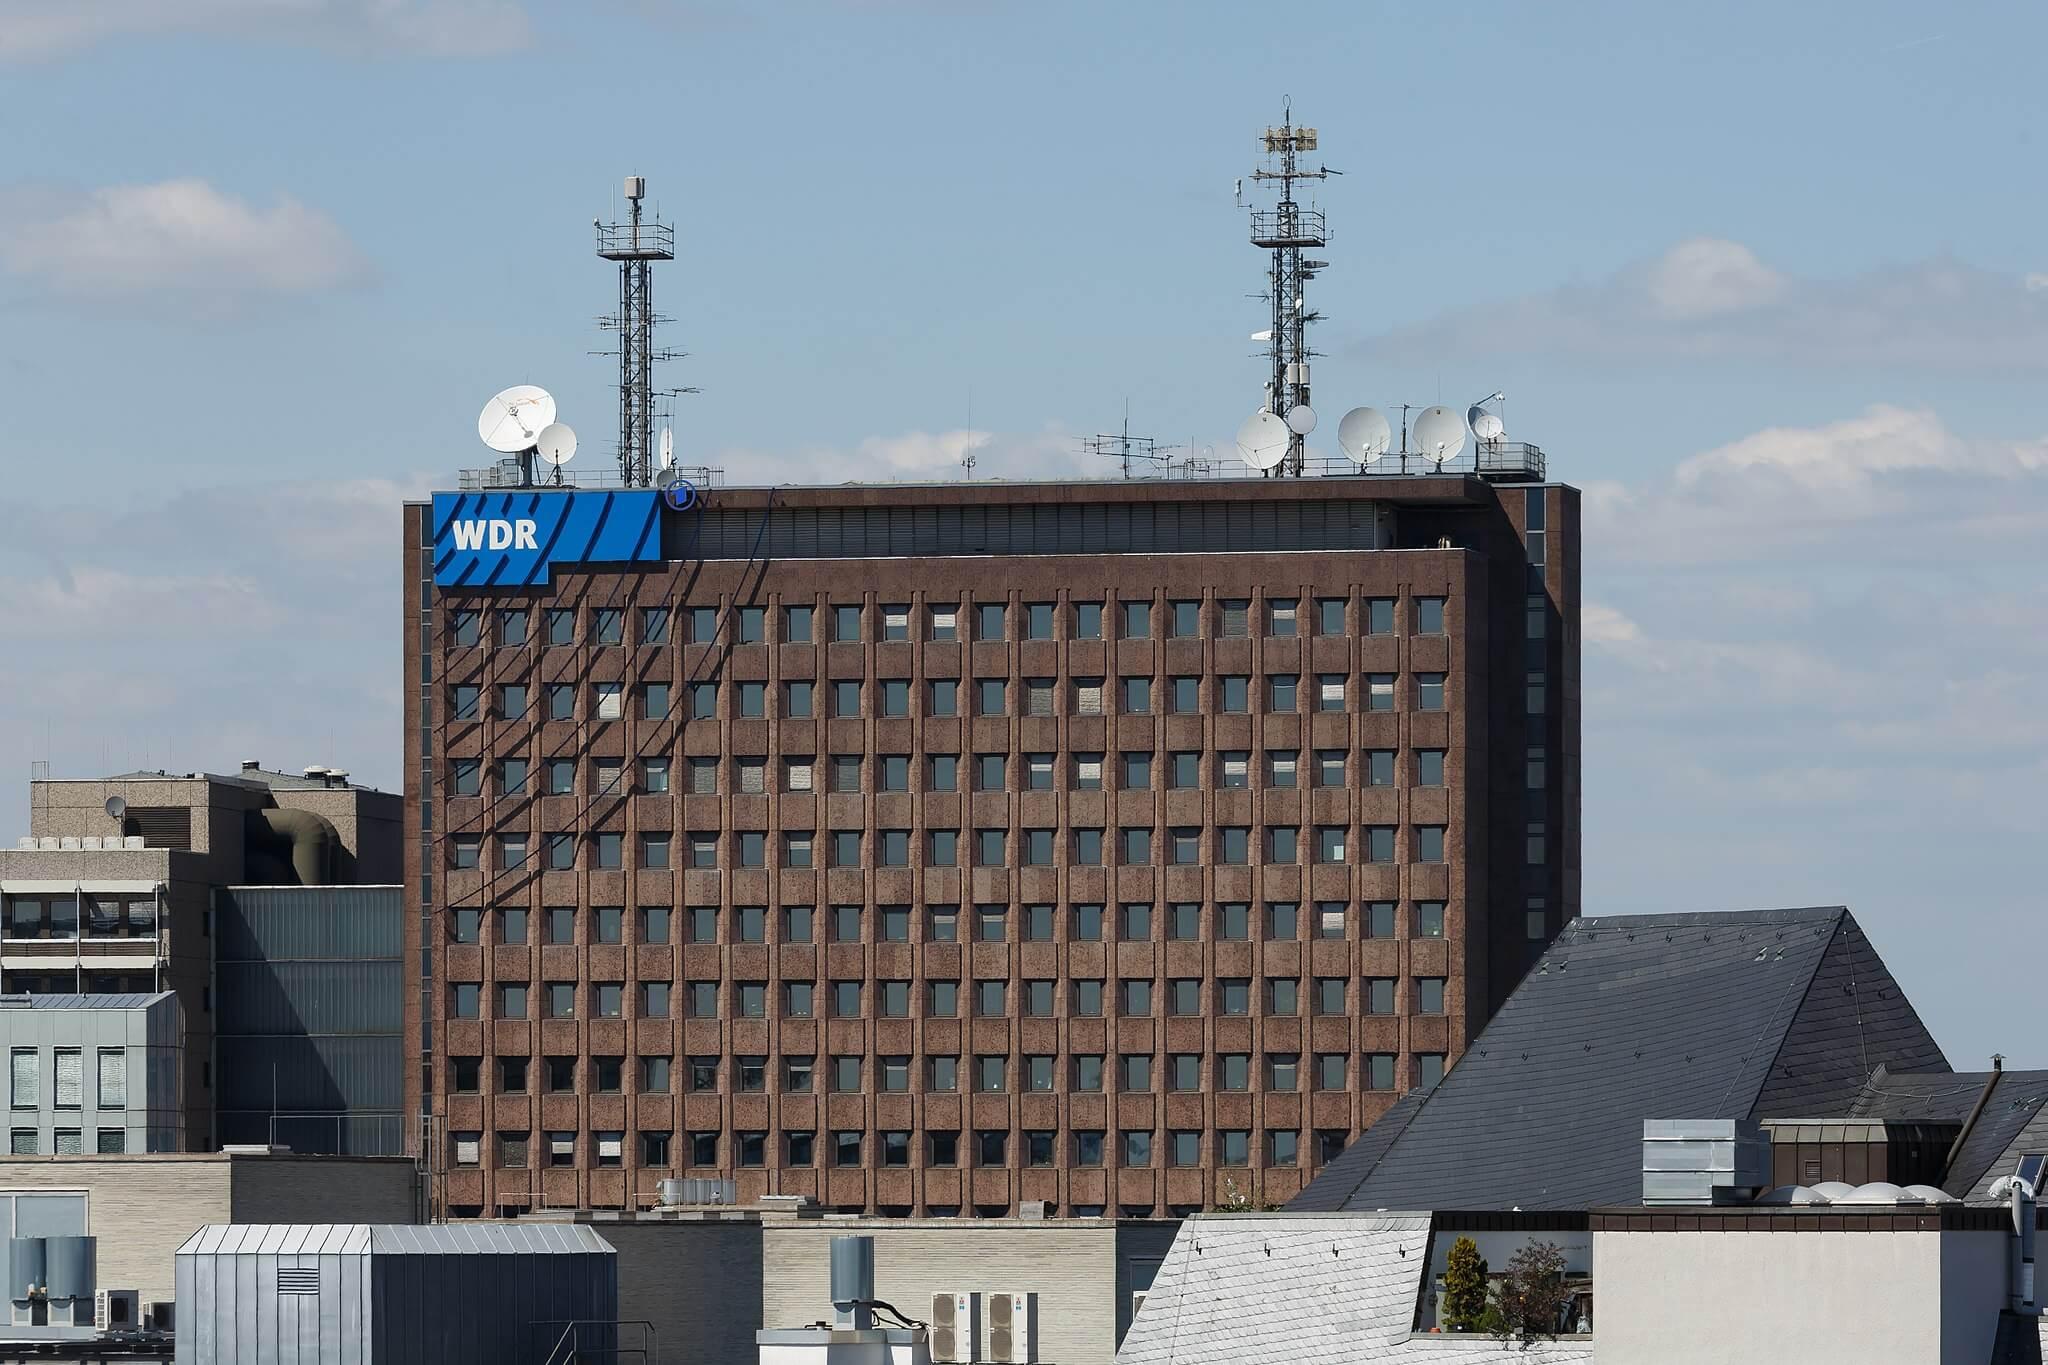 Wdr Gebäude Köln